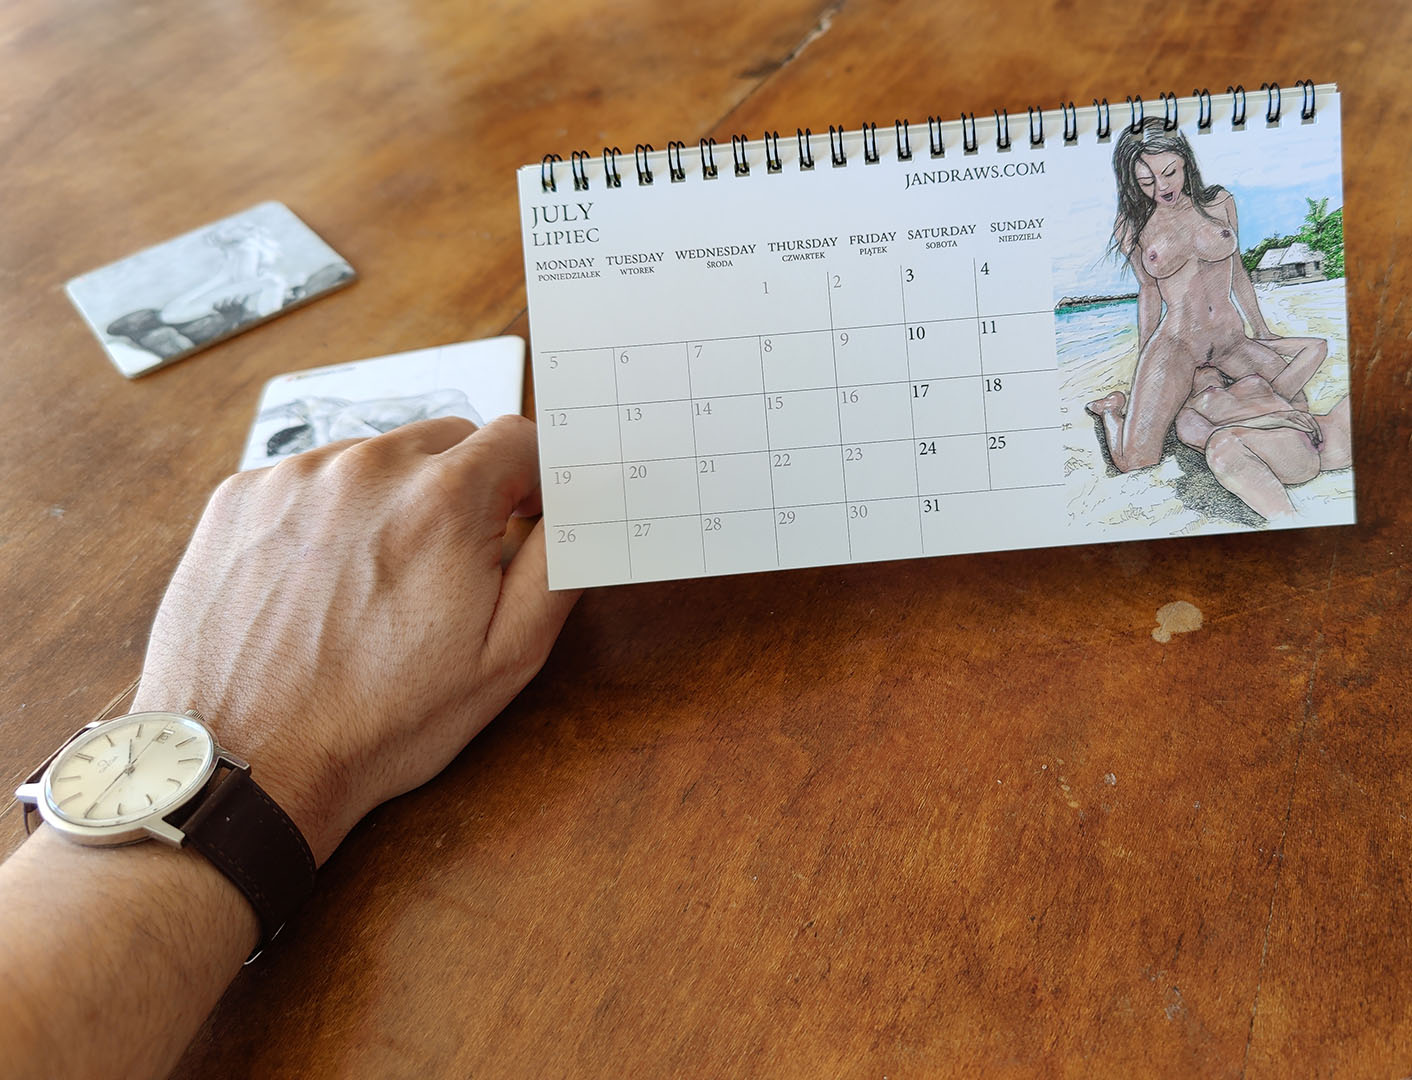 erotic art calendar 2021